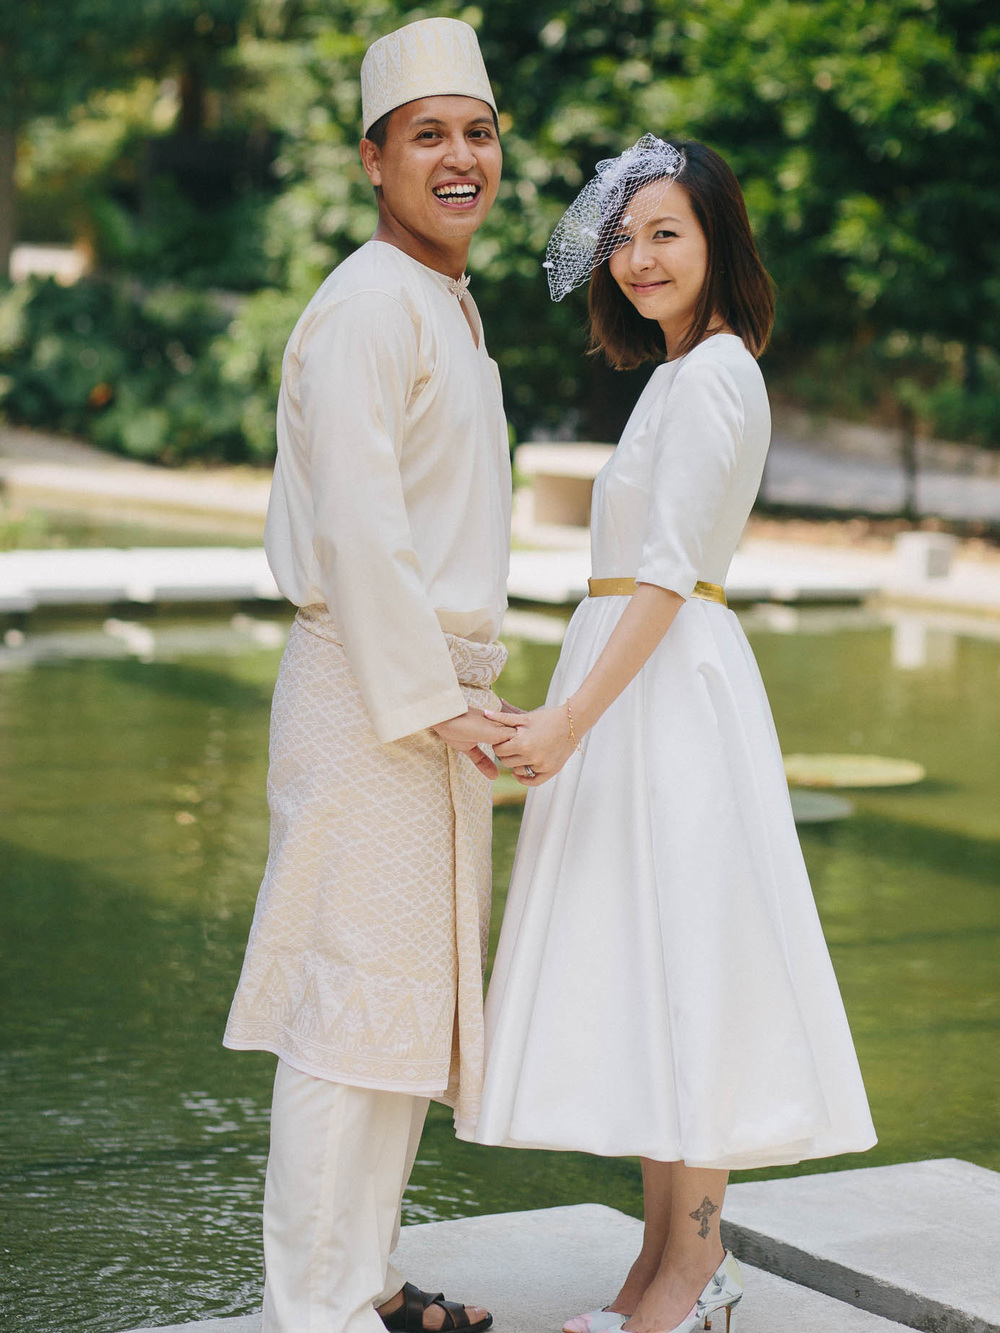 singapore-wedding-photographer-malay-indian-pre-wedding-travel-wmt-2015-alif-ethel-36.jpg